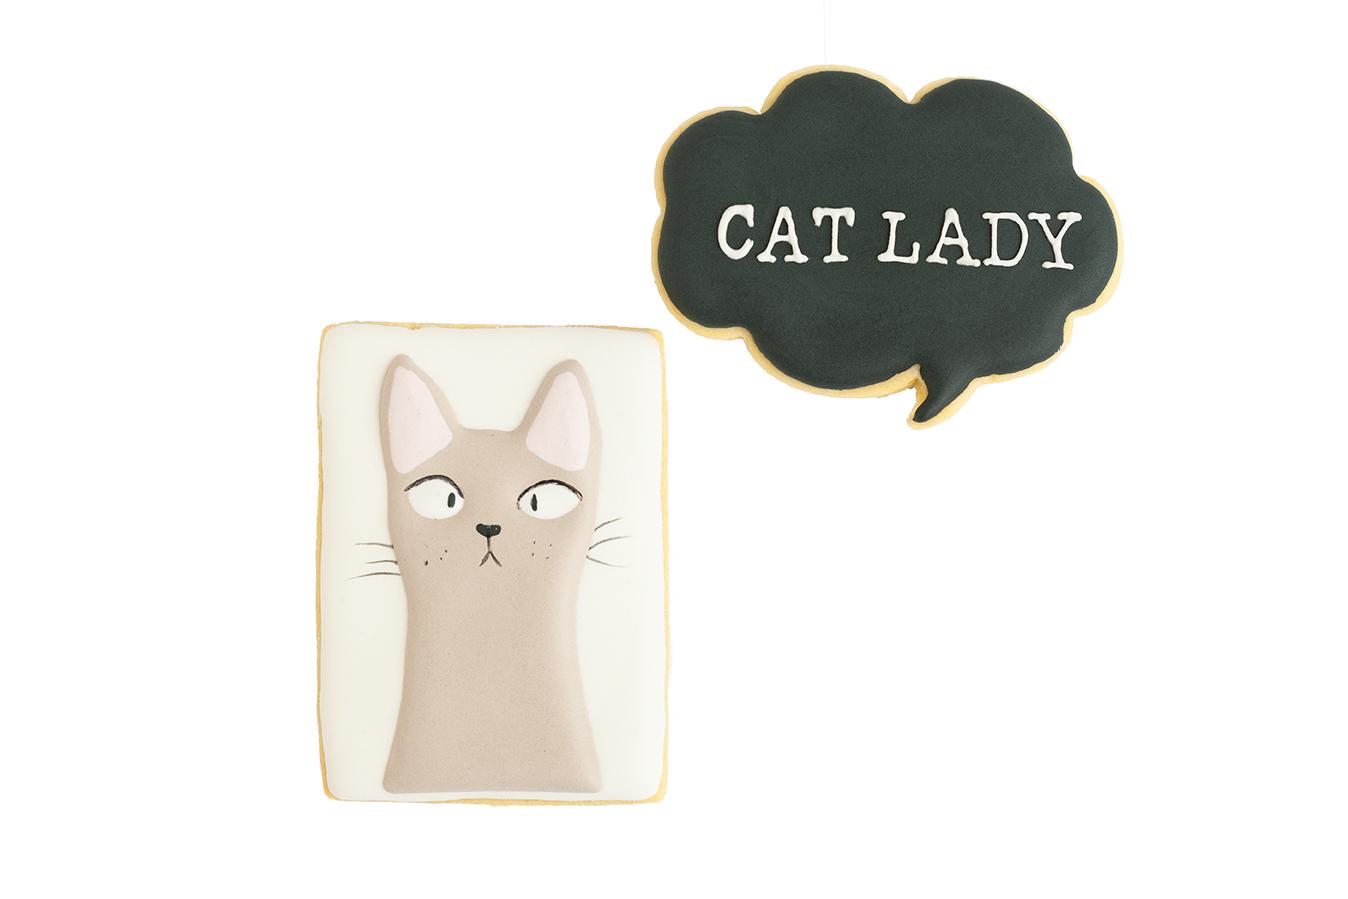 181126 - Catlady.jpg